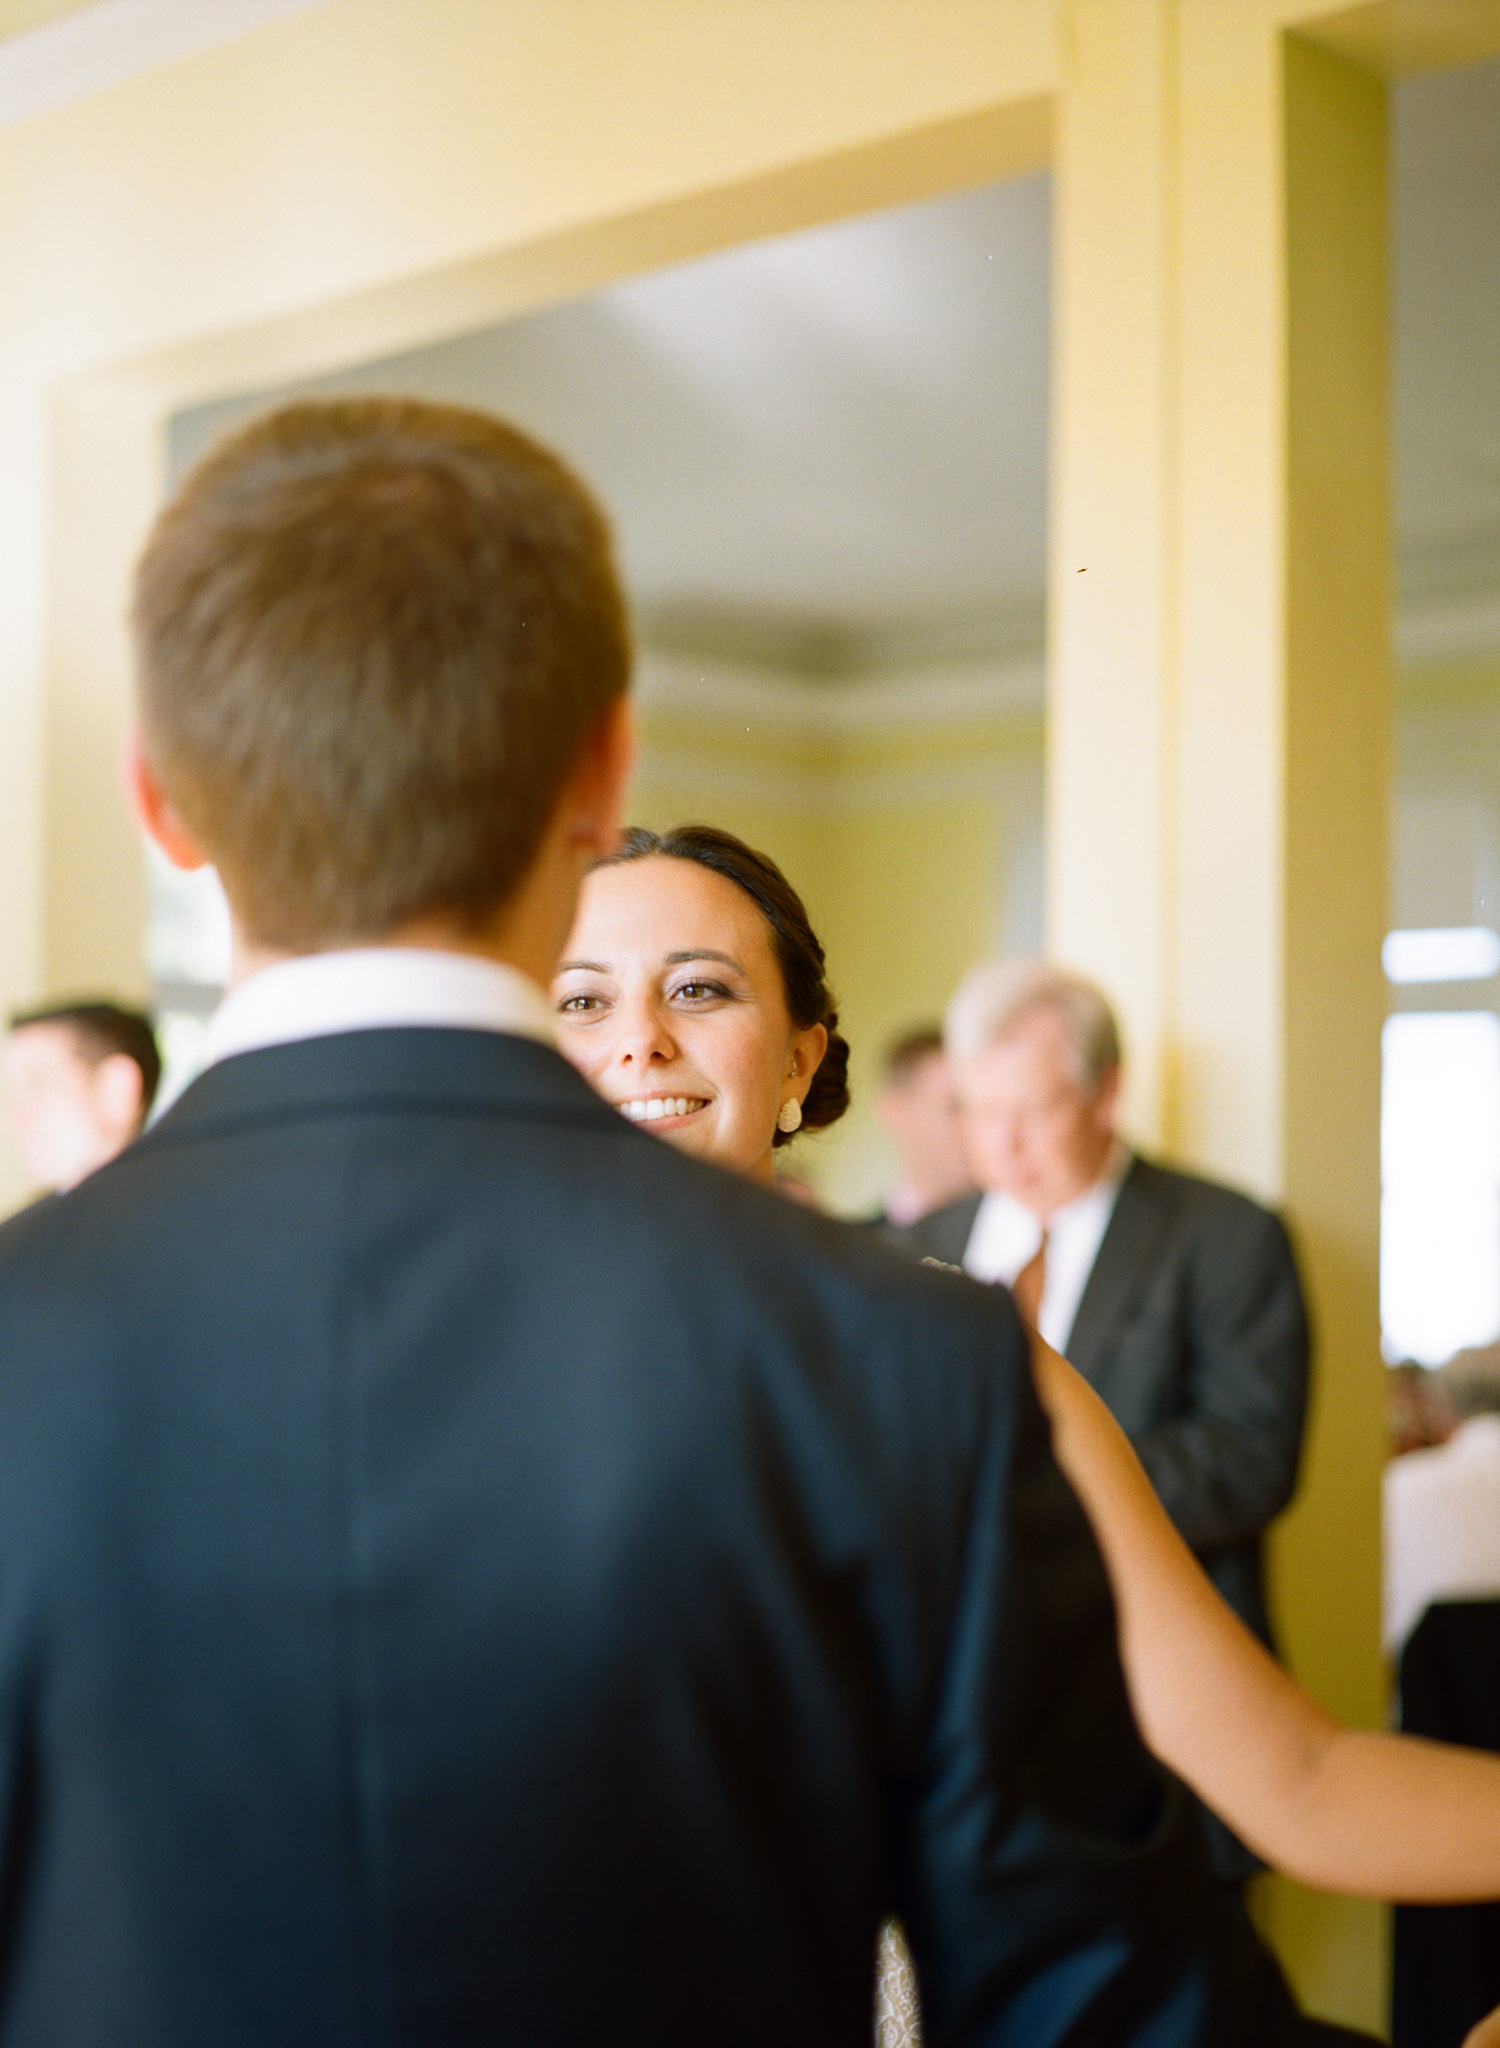 627-josephine-butler-parks-center-wedding-photography.jpg